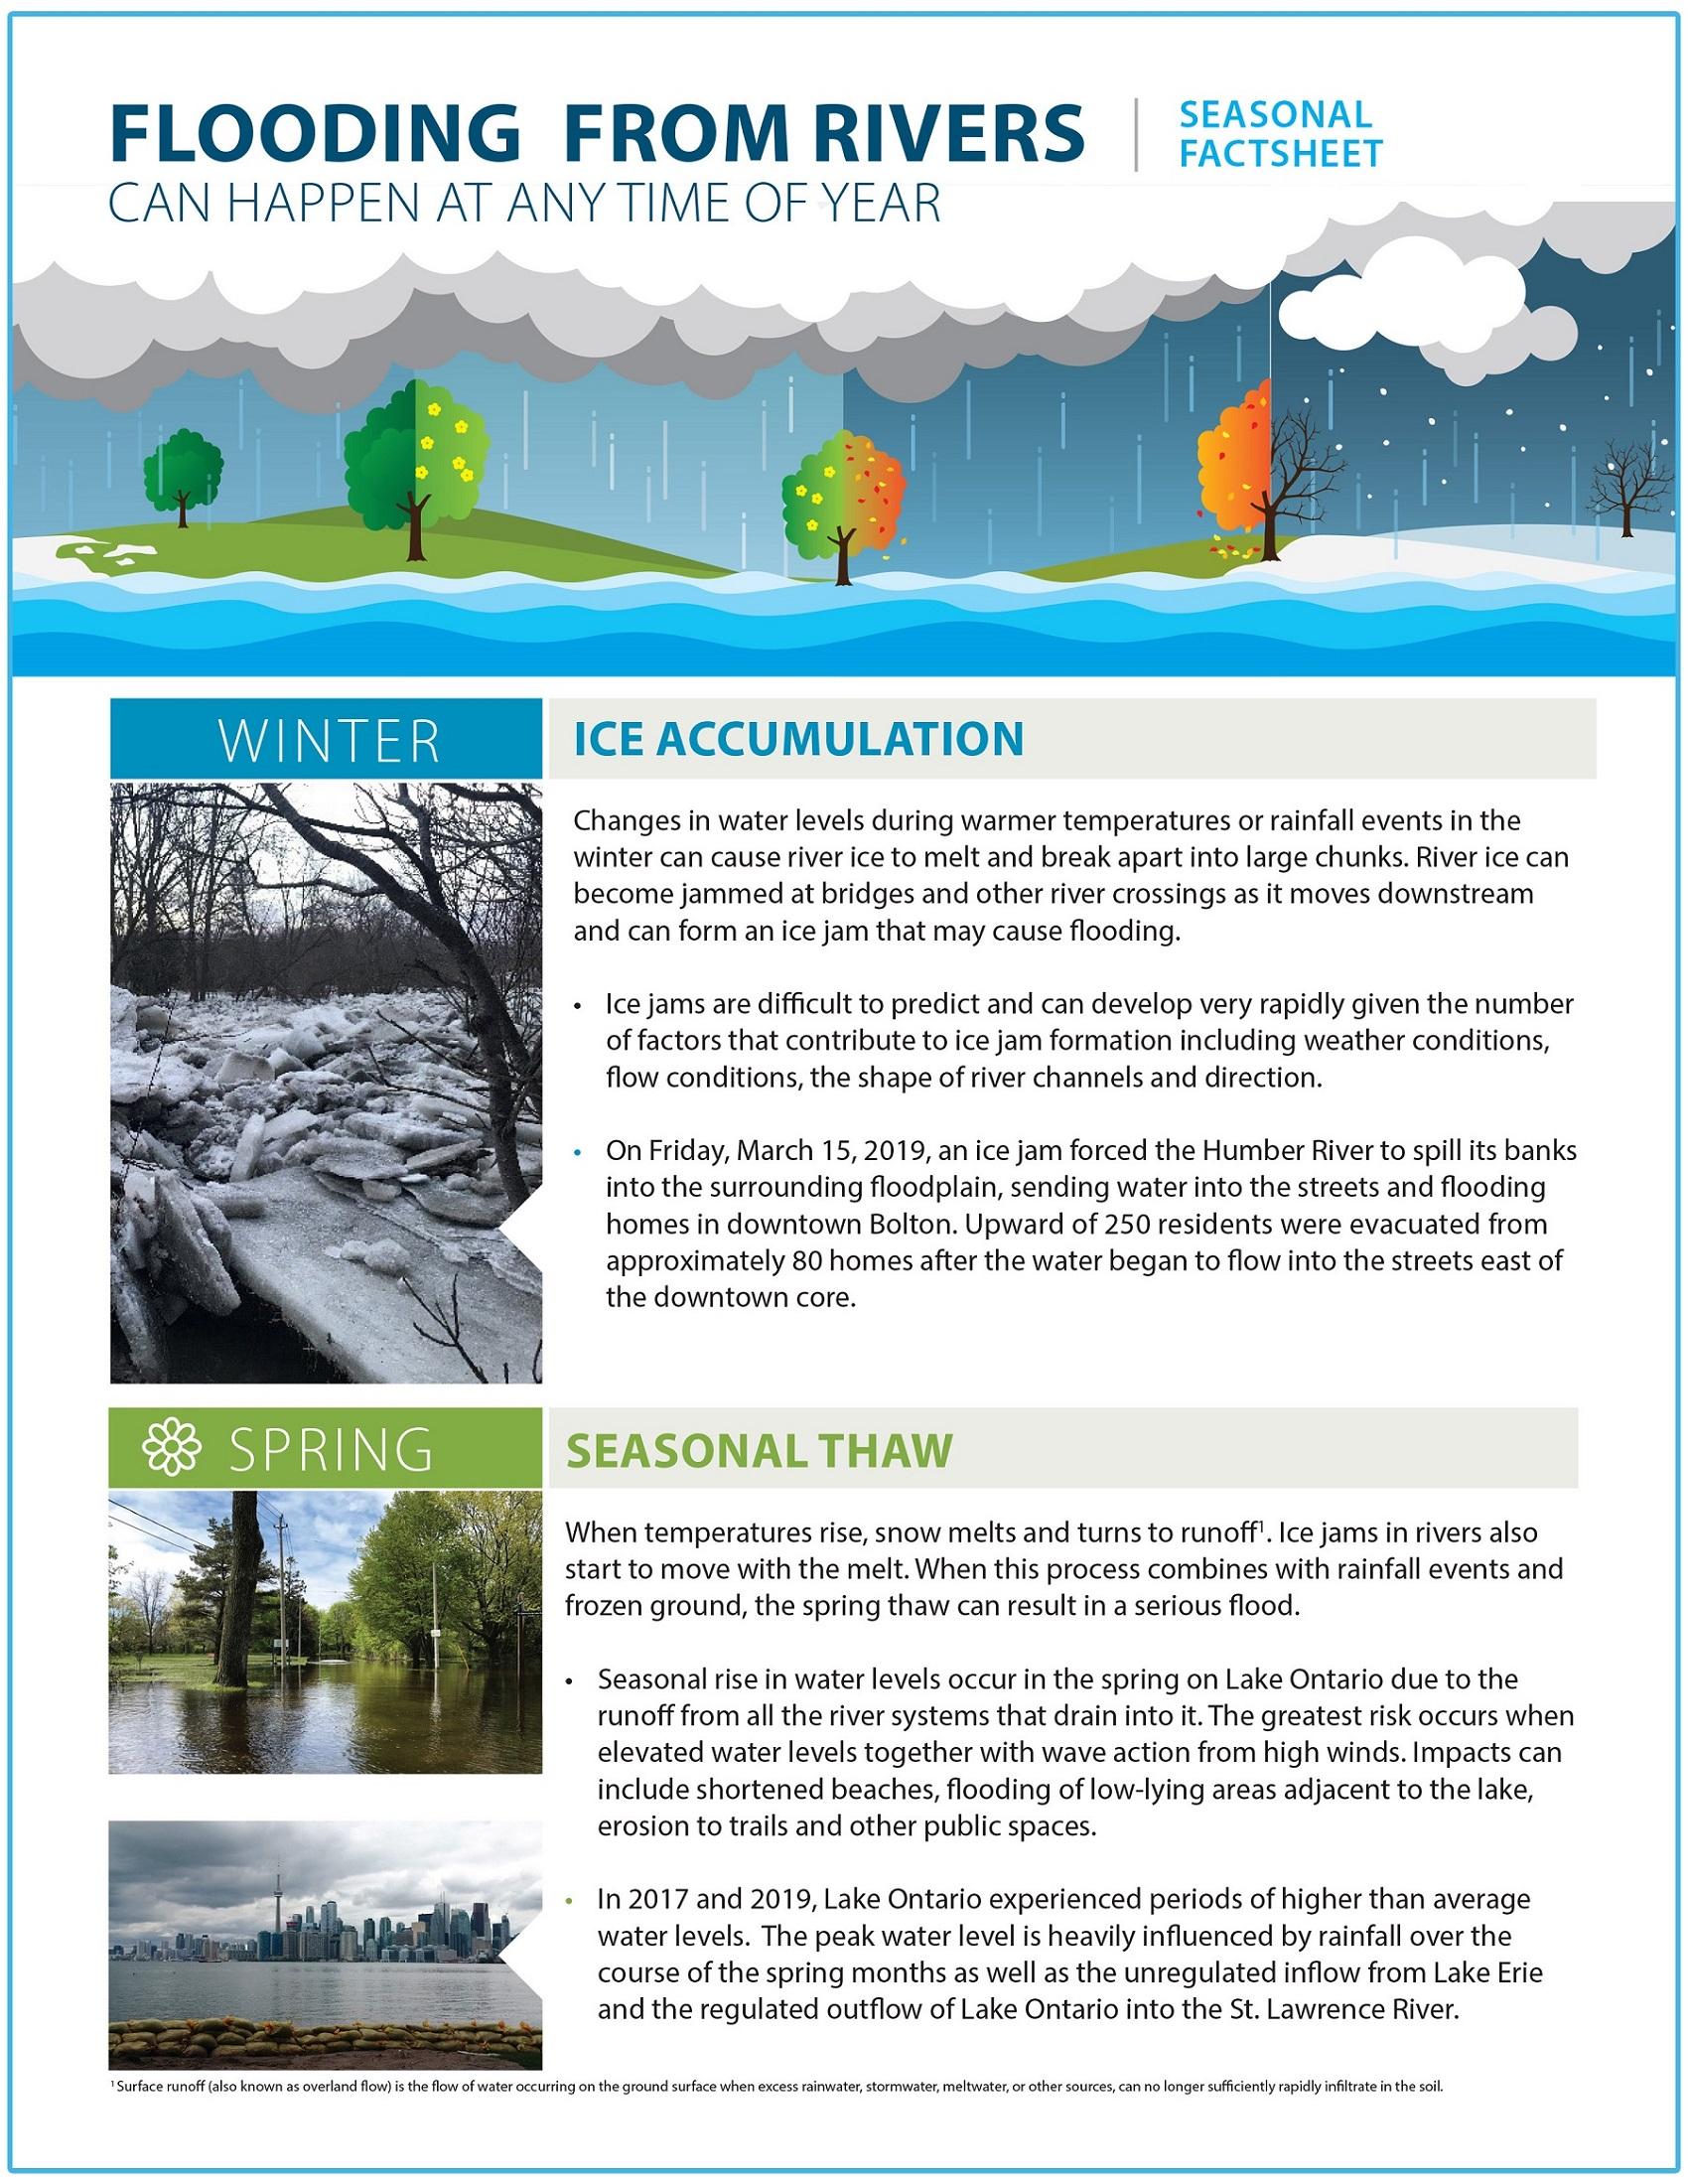 TRCA seasonal flooding fact sheet page 1